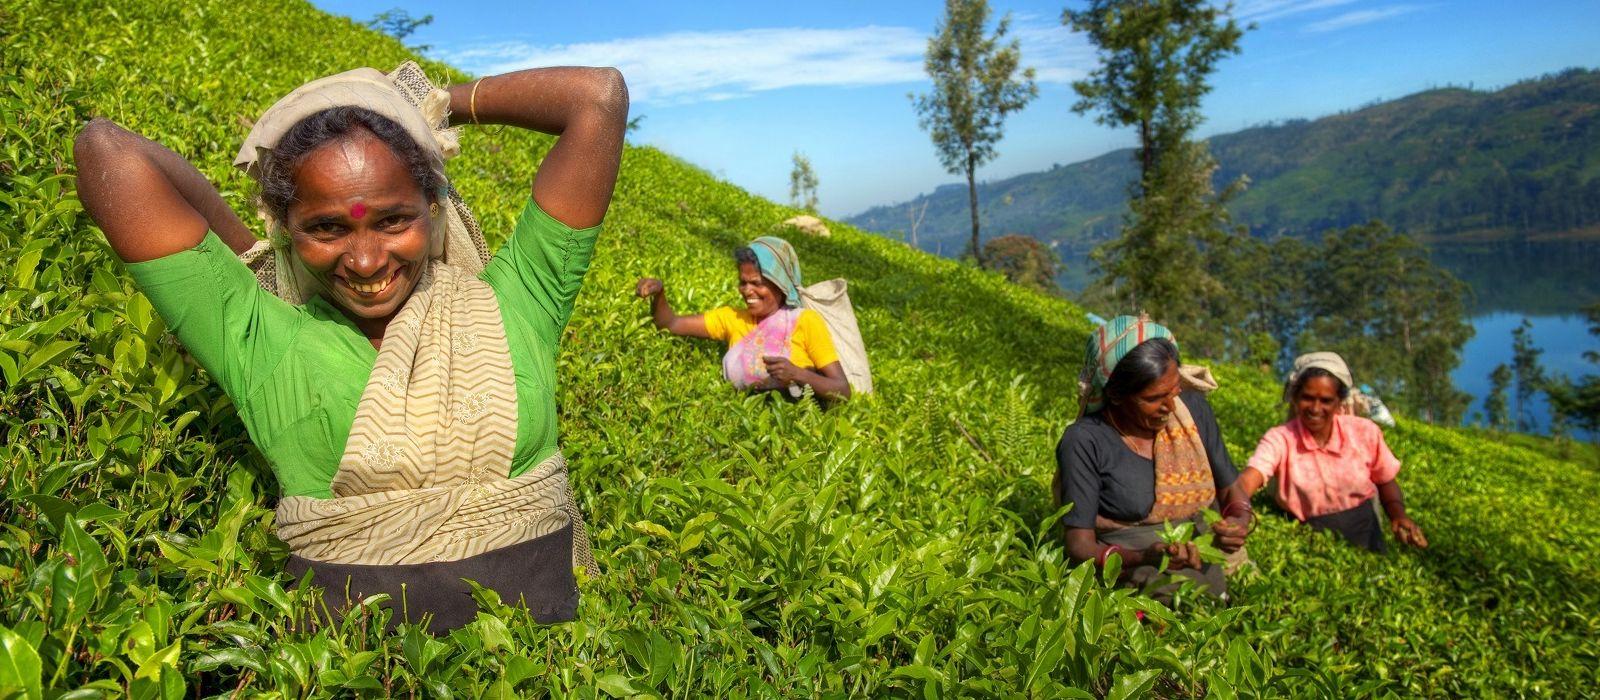 Sri Lanka: Reise zur Heimat des berühmten Ceylon-Tees Urlaub 1